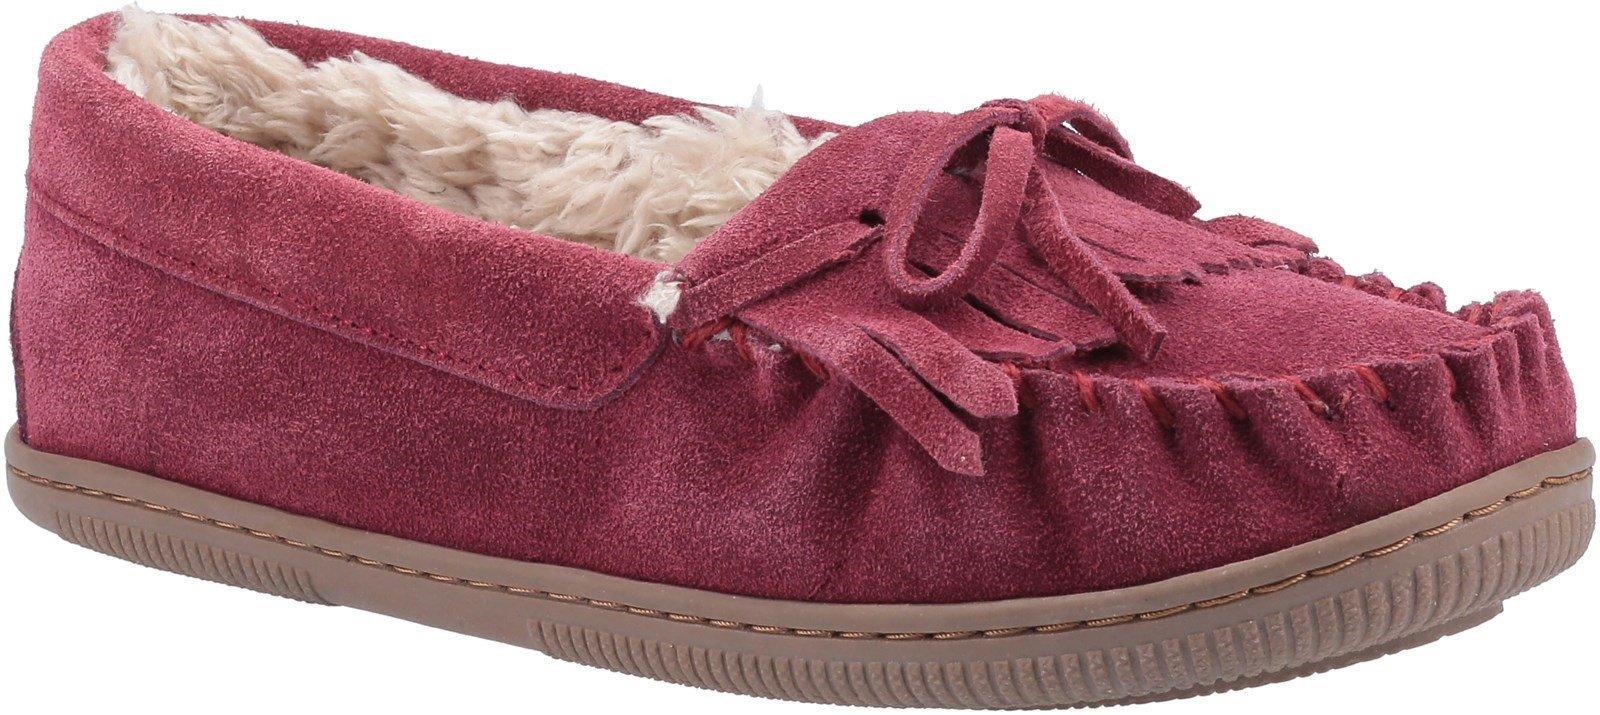 Hush Puppies Women's Addy Slip On Slipper Various Colours 29194 - Burgundy 3